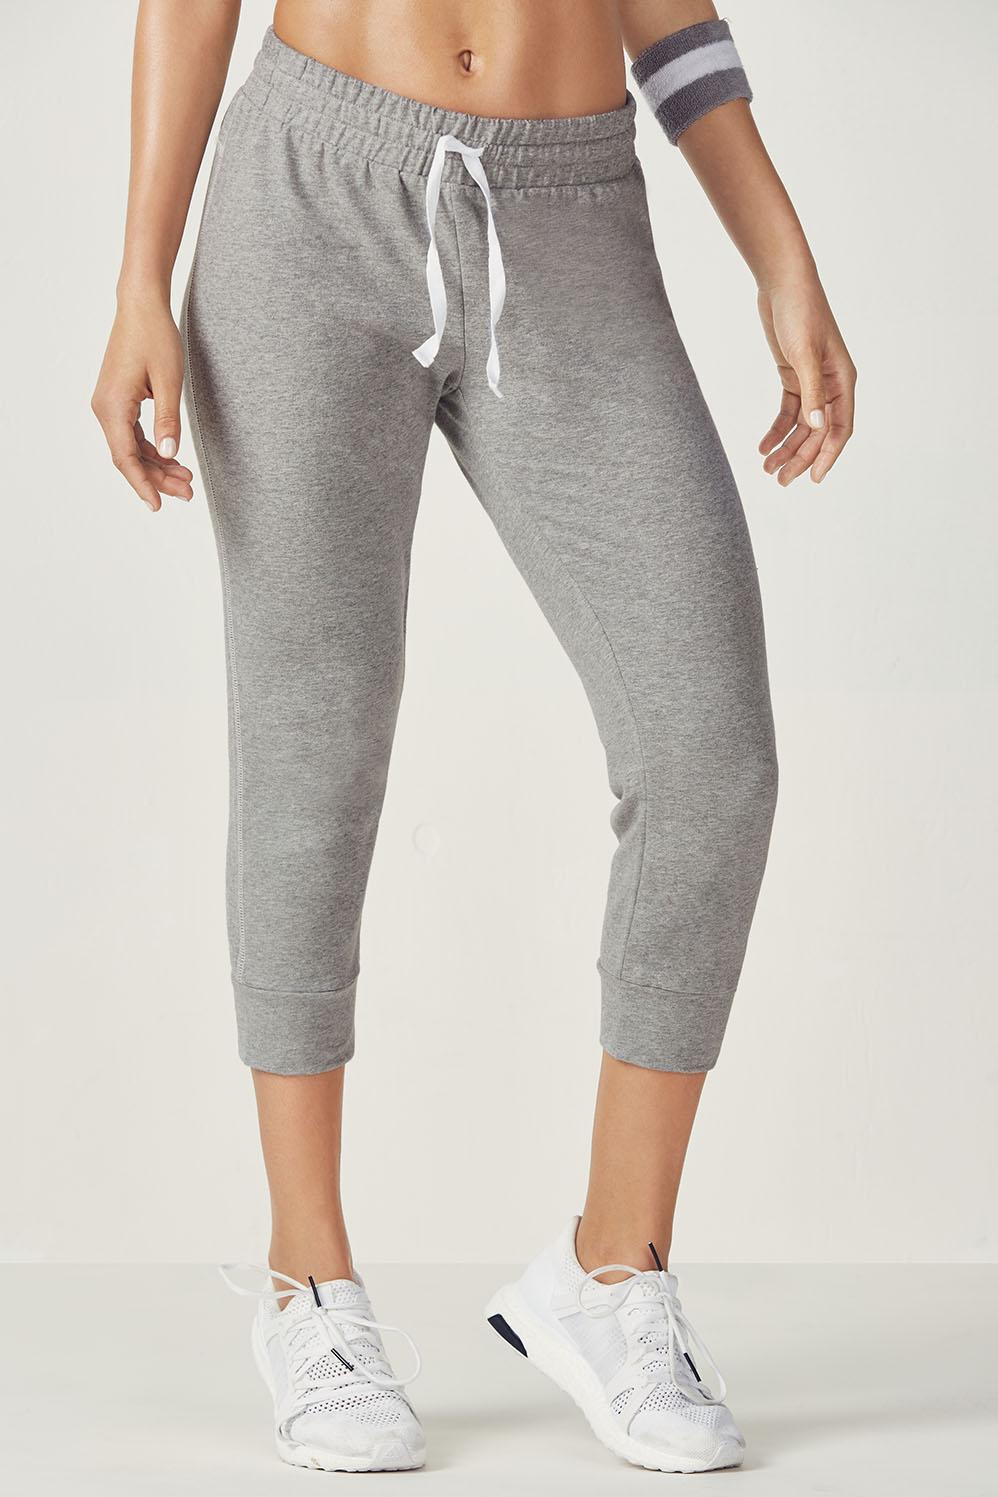 Fabletics Capri Miriam Jogger Pants Womens Gray Size M